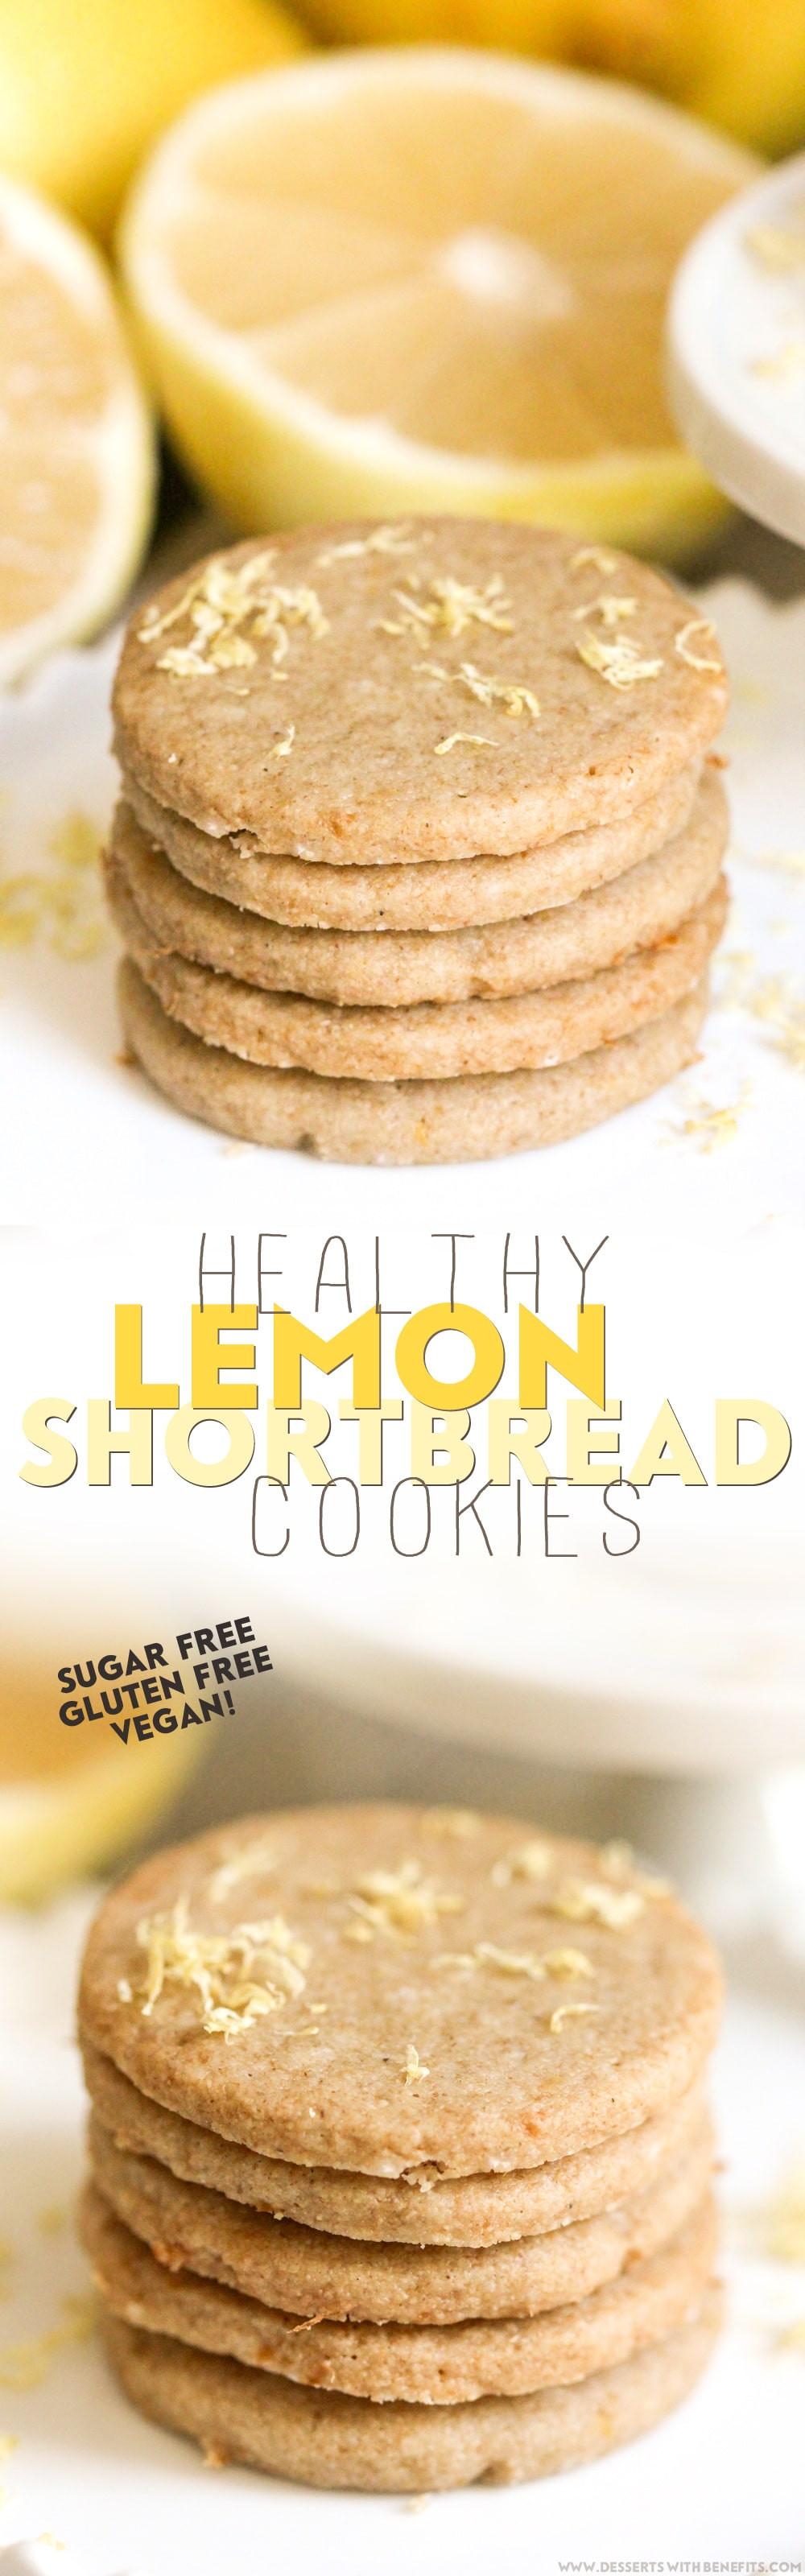 Healthy Lemon Dessert Recipes  Healthy Lemon Shortbread Cookies recipe sugar free